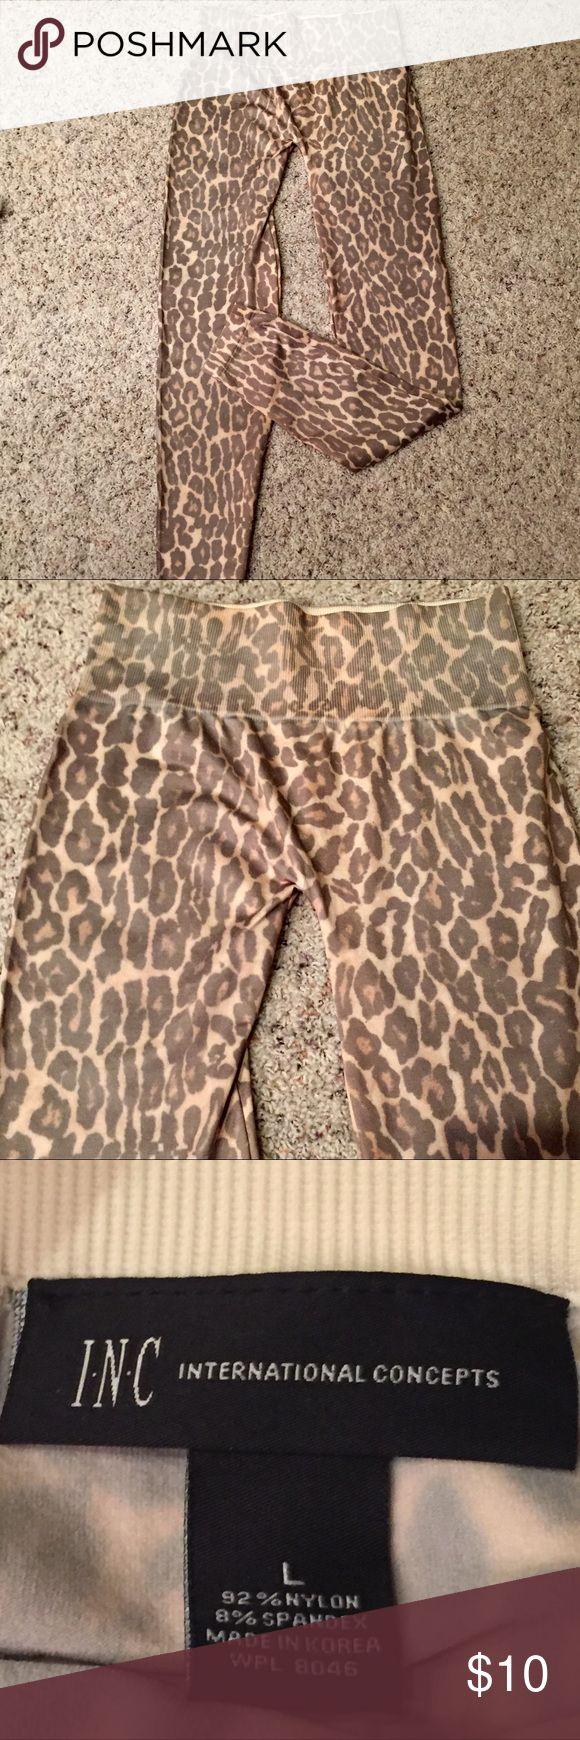 INC New Leopard leggings New w/o tag INC Leopard Leggings, super adorable😜 INC International Concepts Pants Leggings